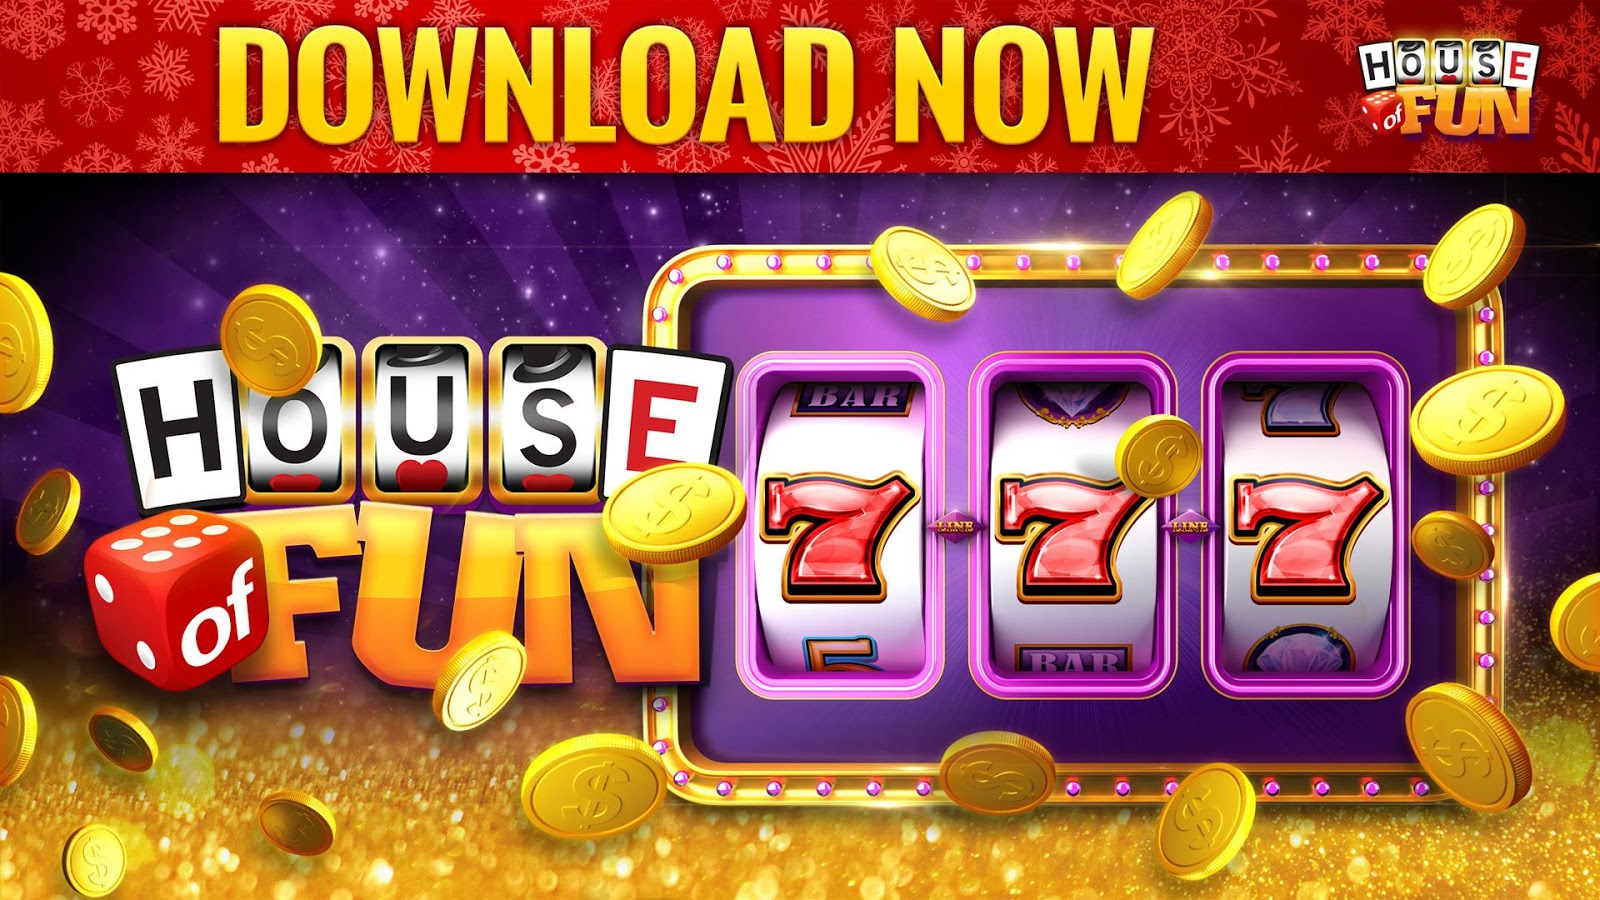 Slots casino for fun